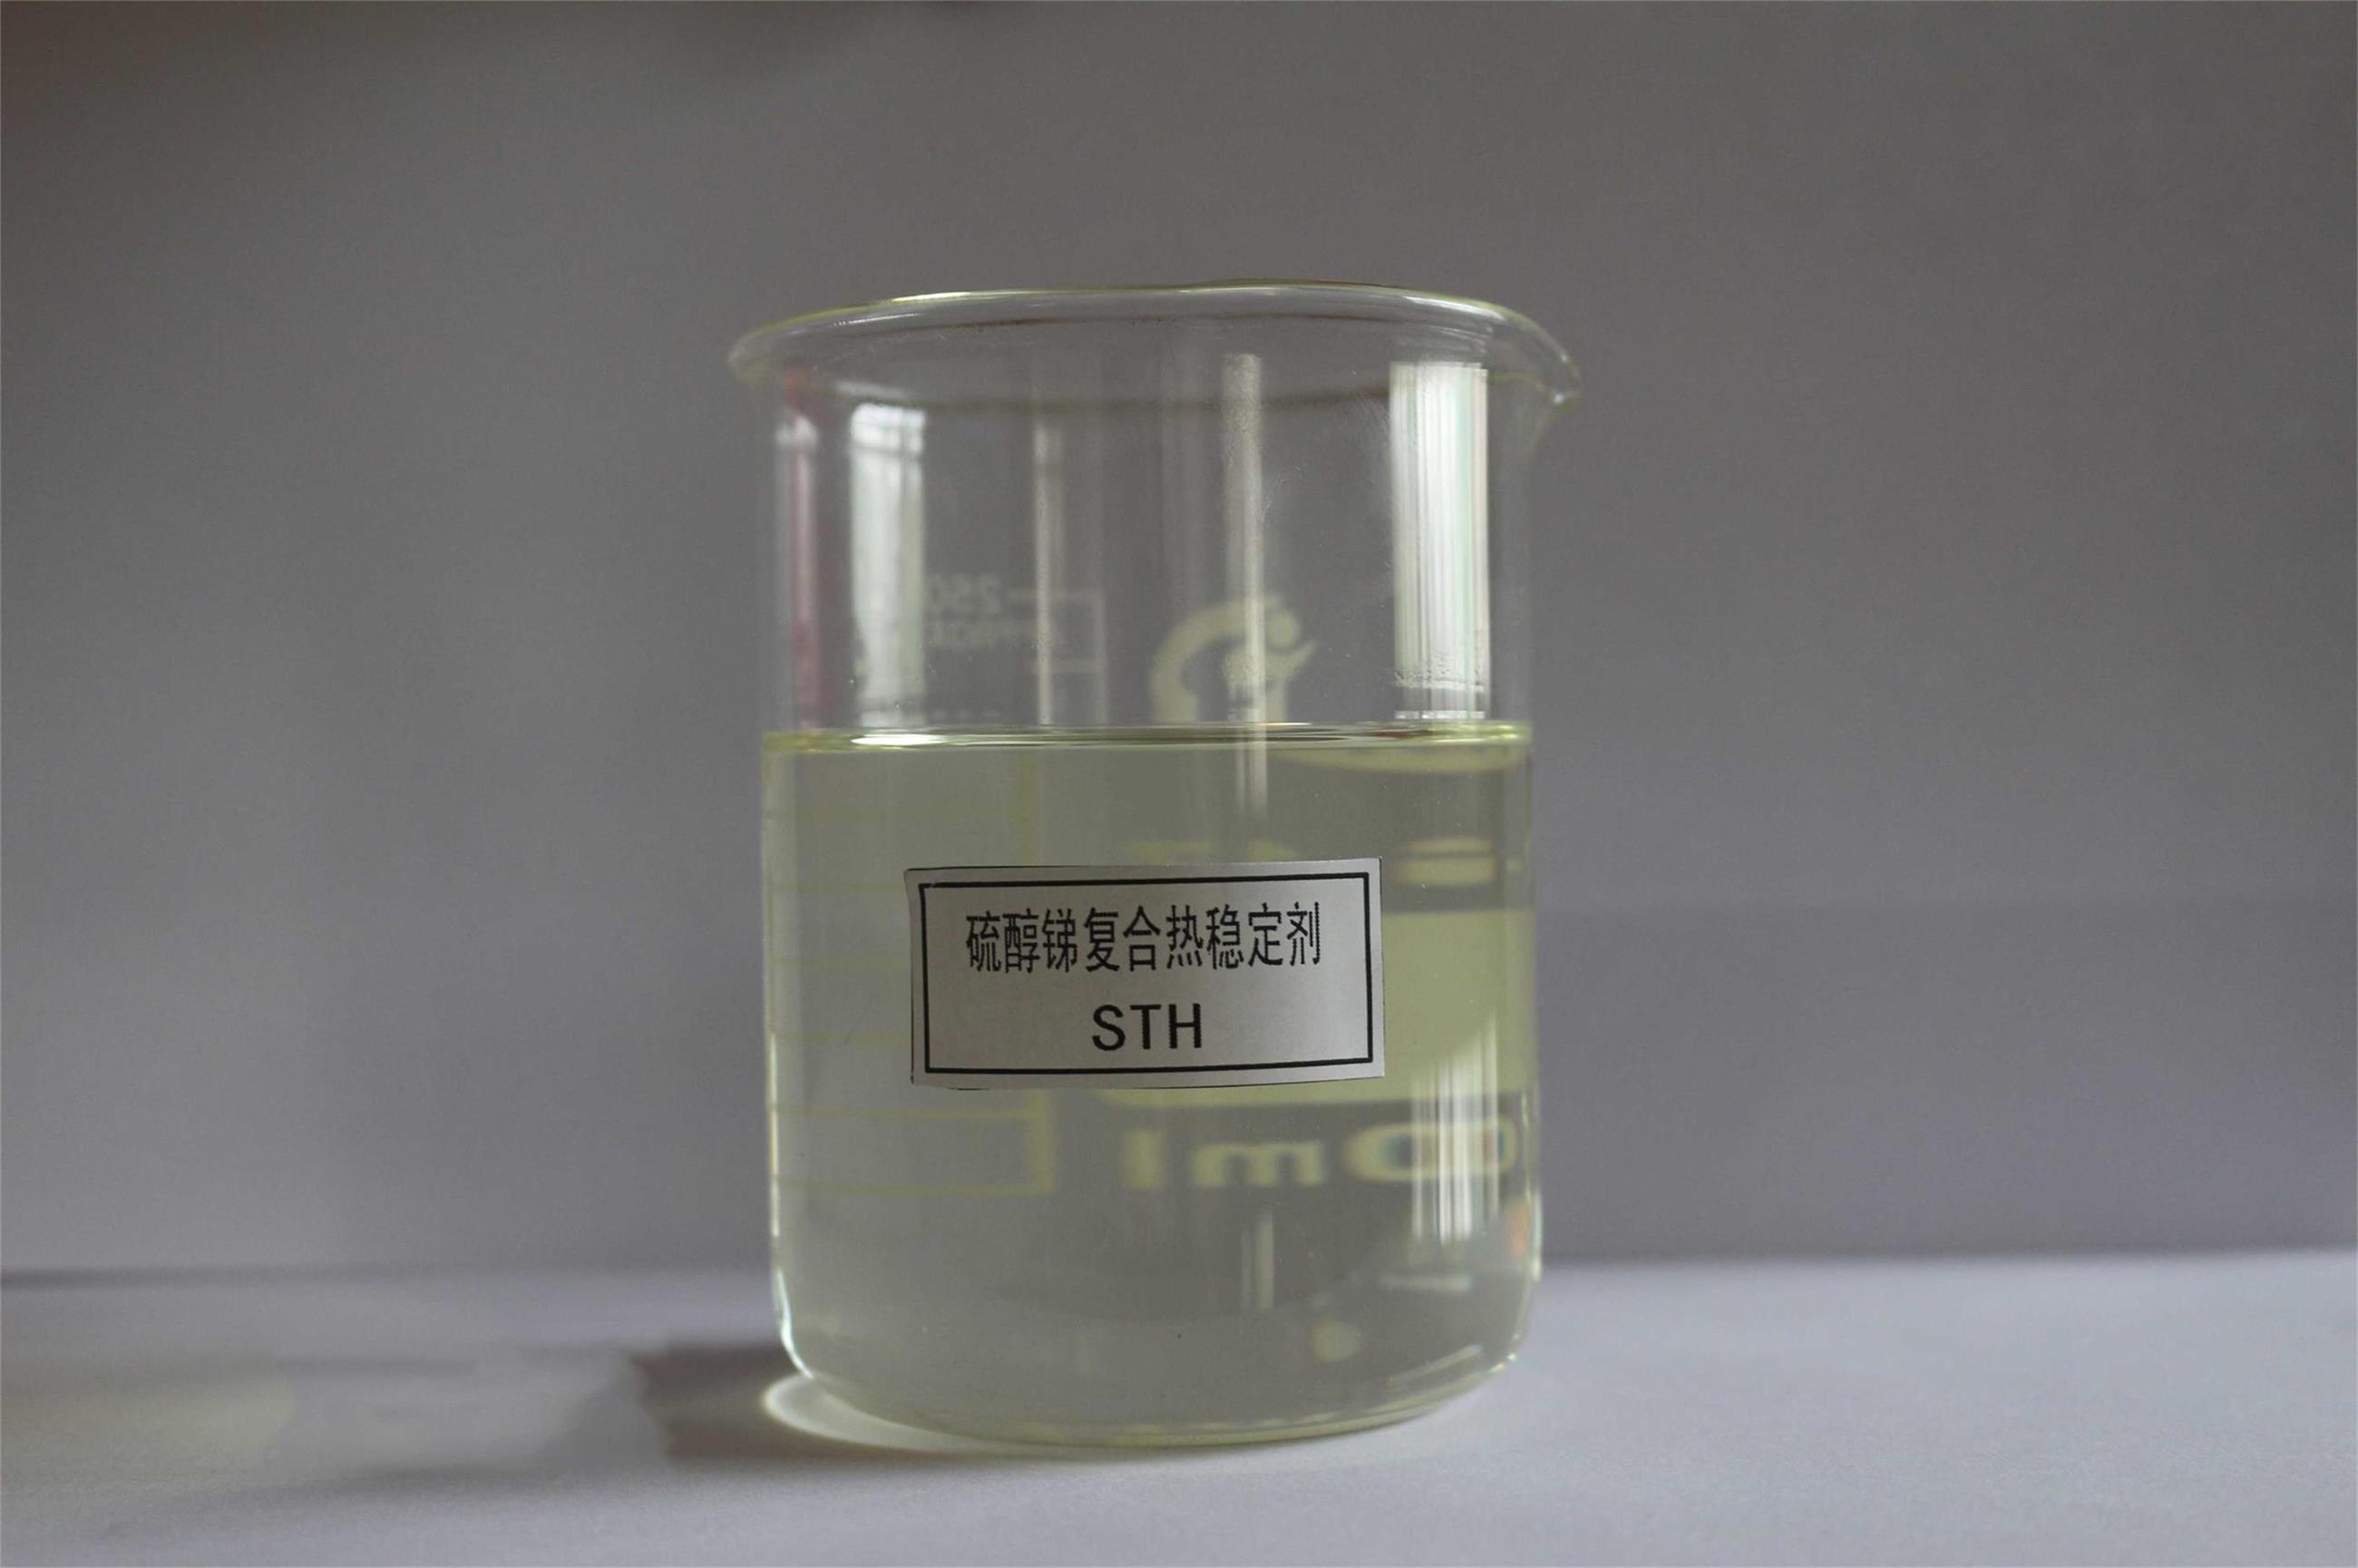 滨州划算的硫醇锑STH_硫醇锑